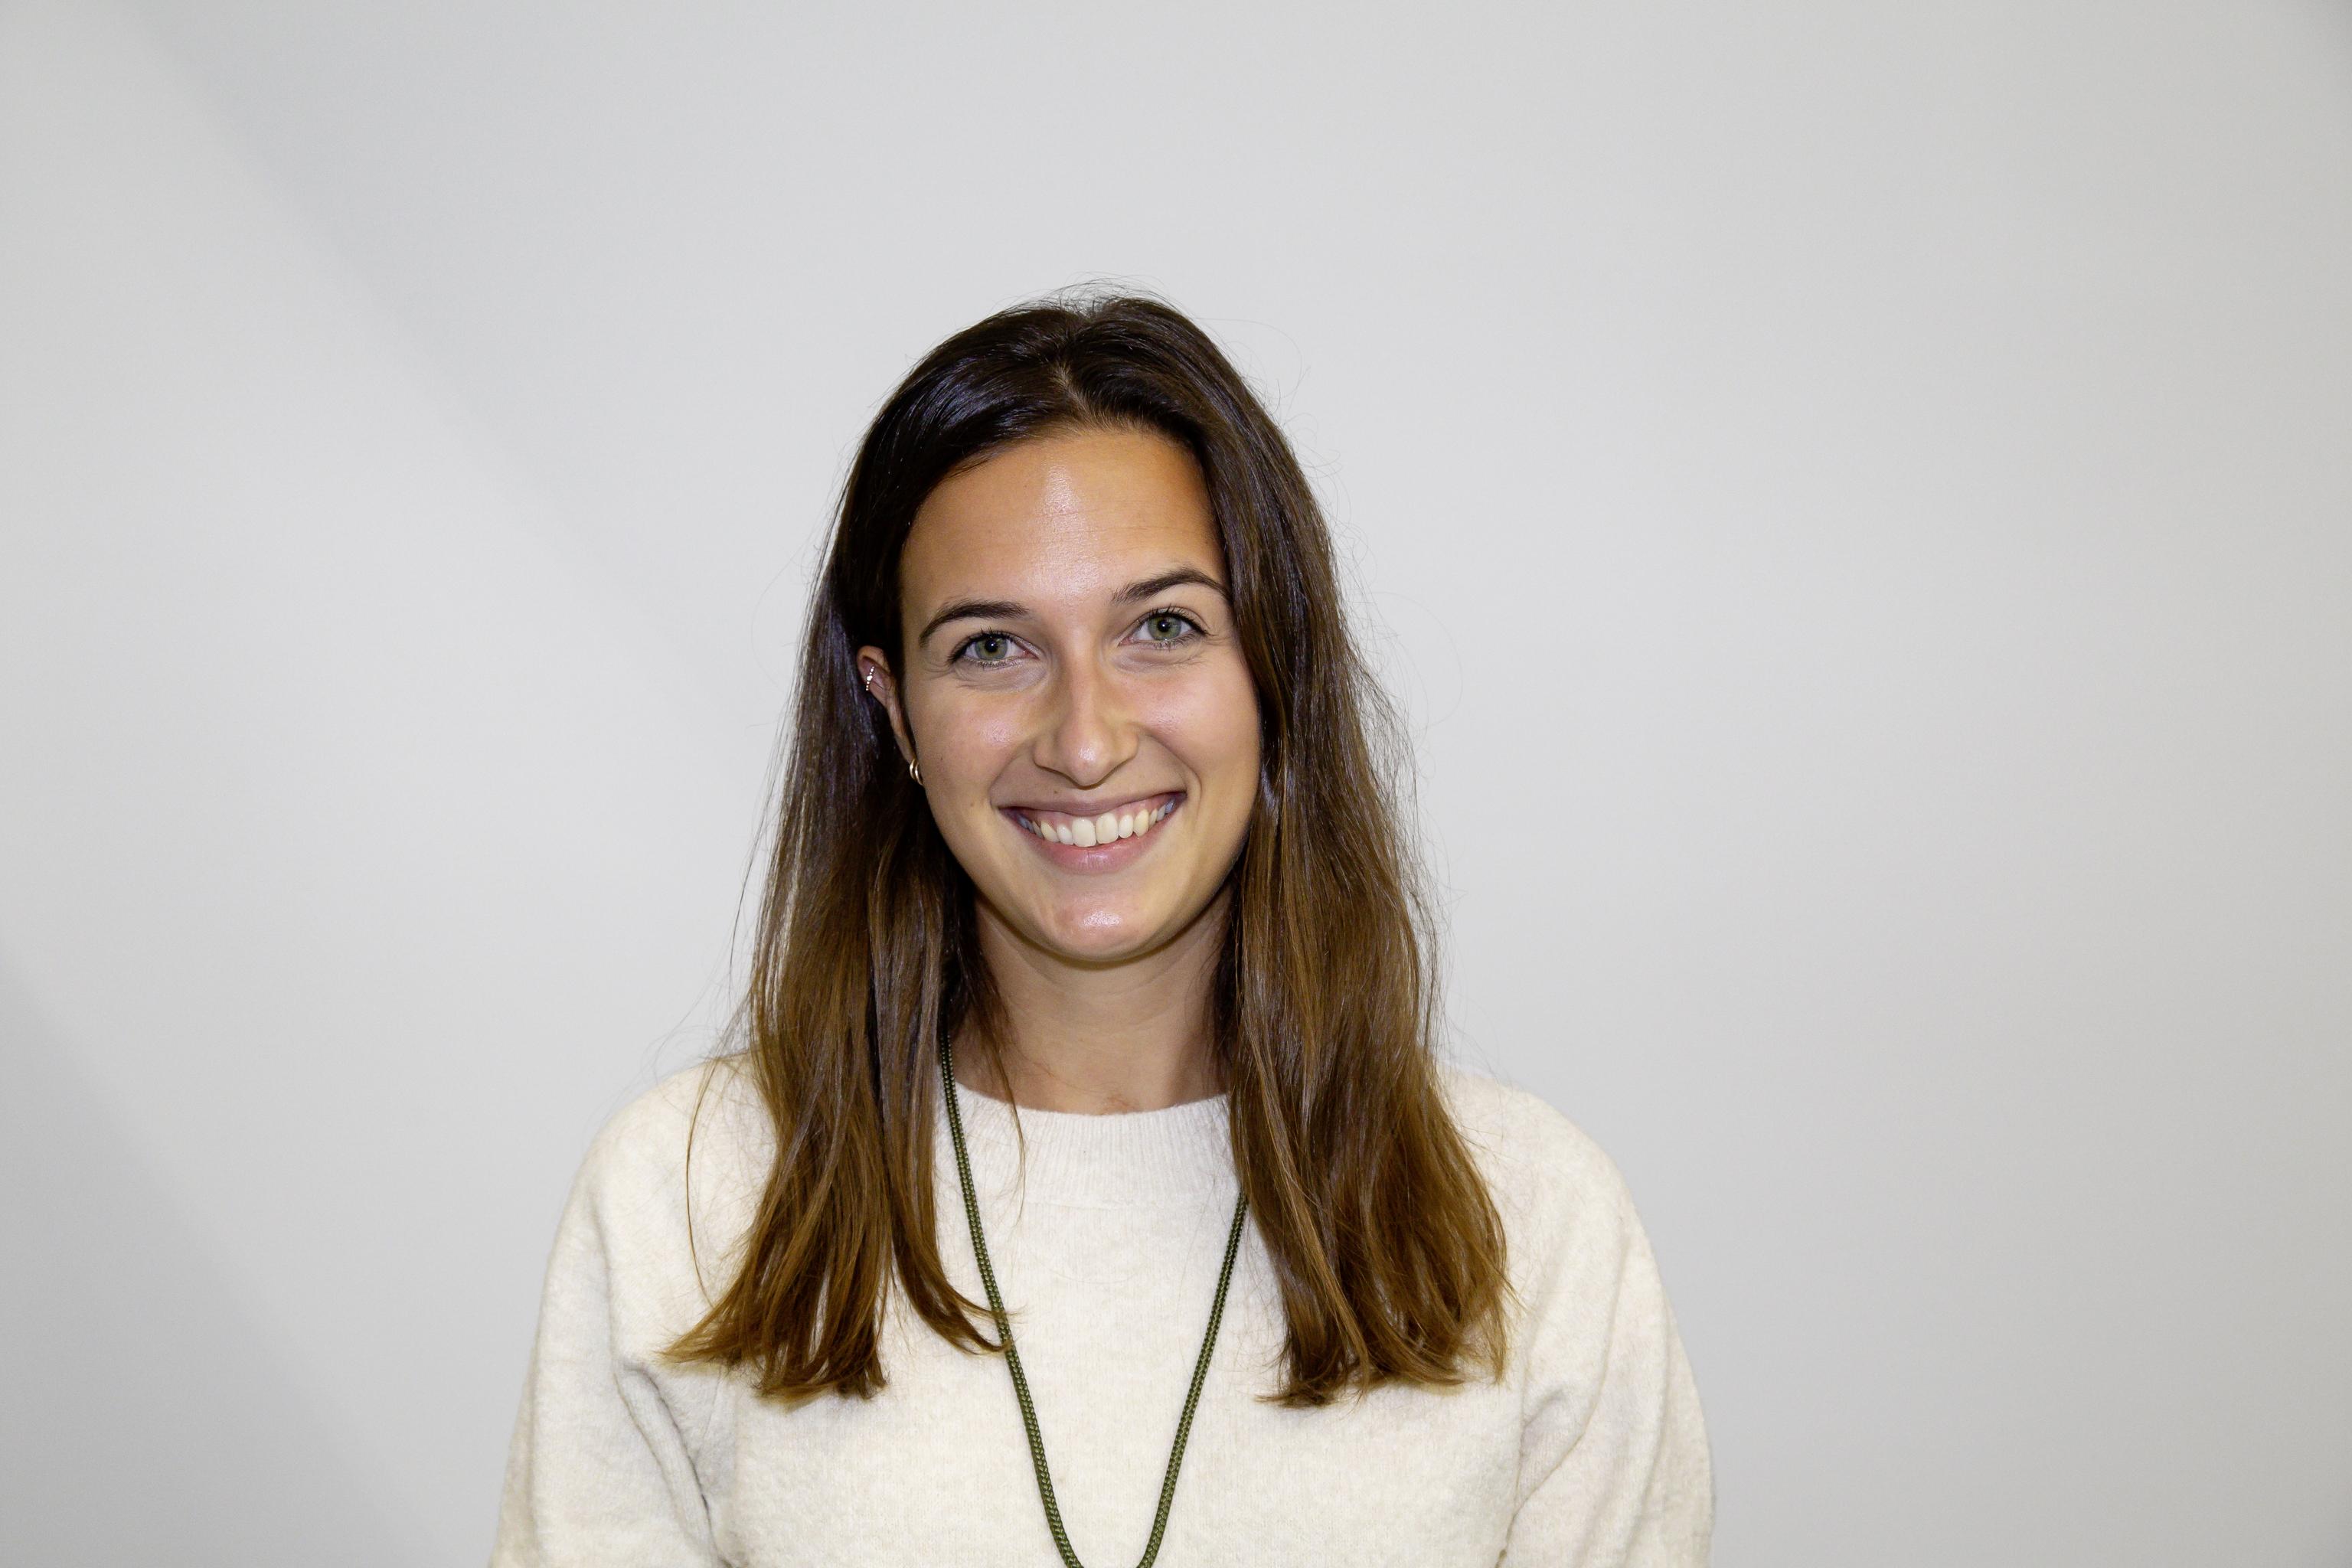 Corinna Gutmann